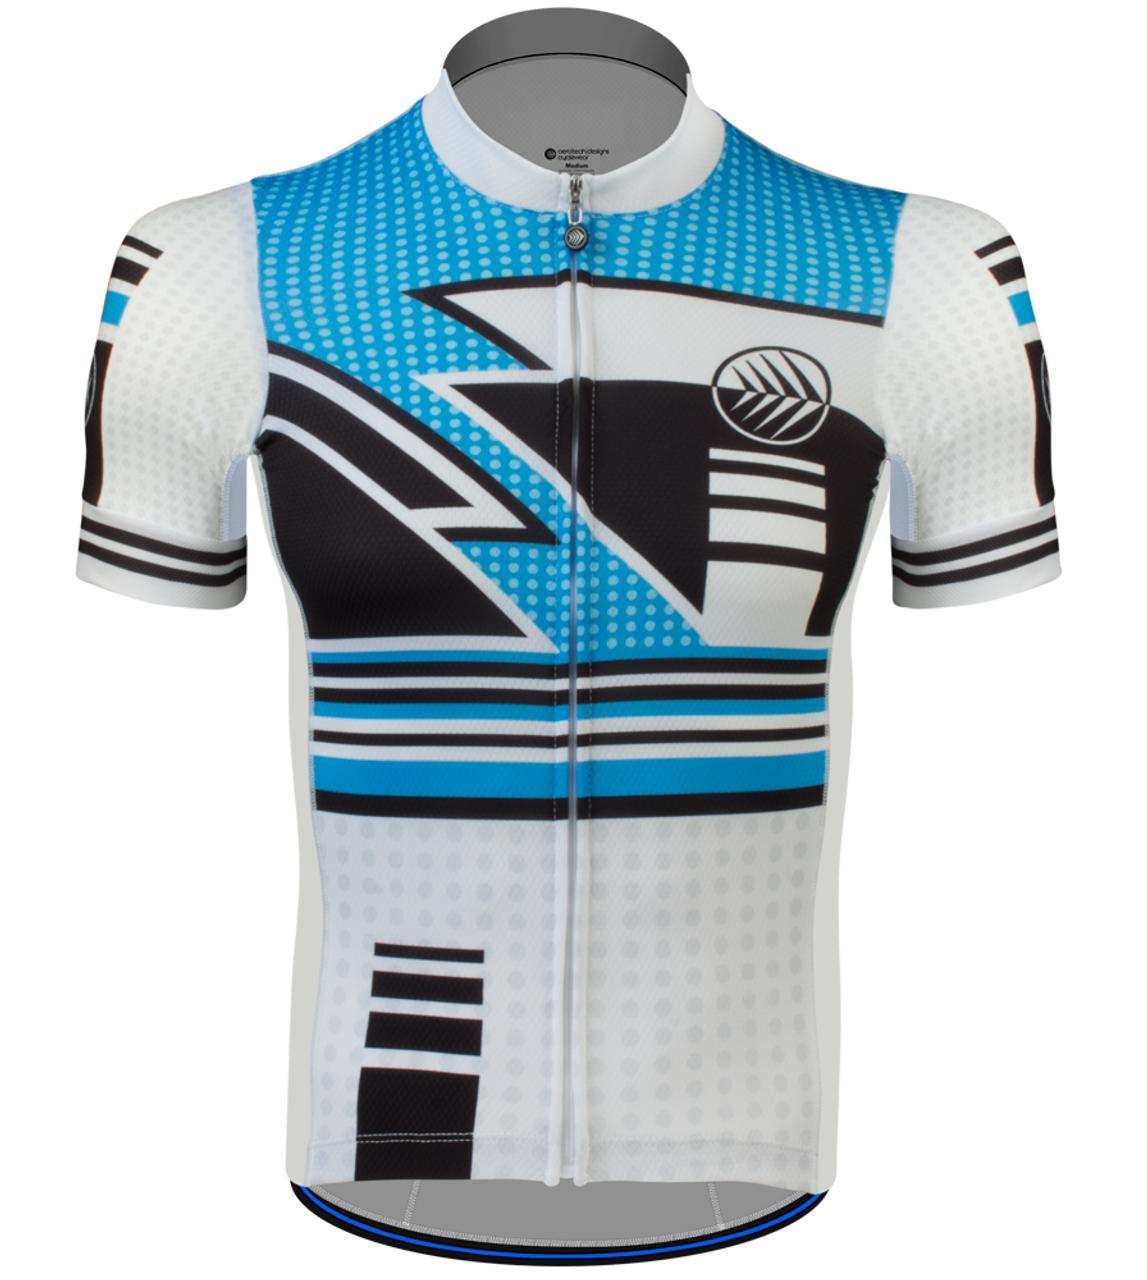 Aero Tech Men s Race Fit Cycling Jersey Metric Premiere Jerseys 49c7628c3